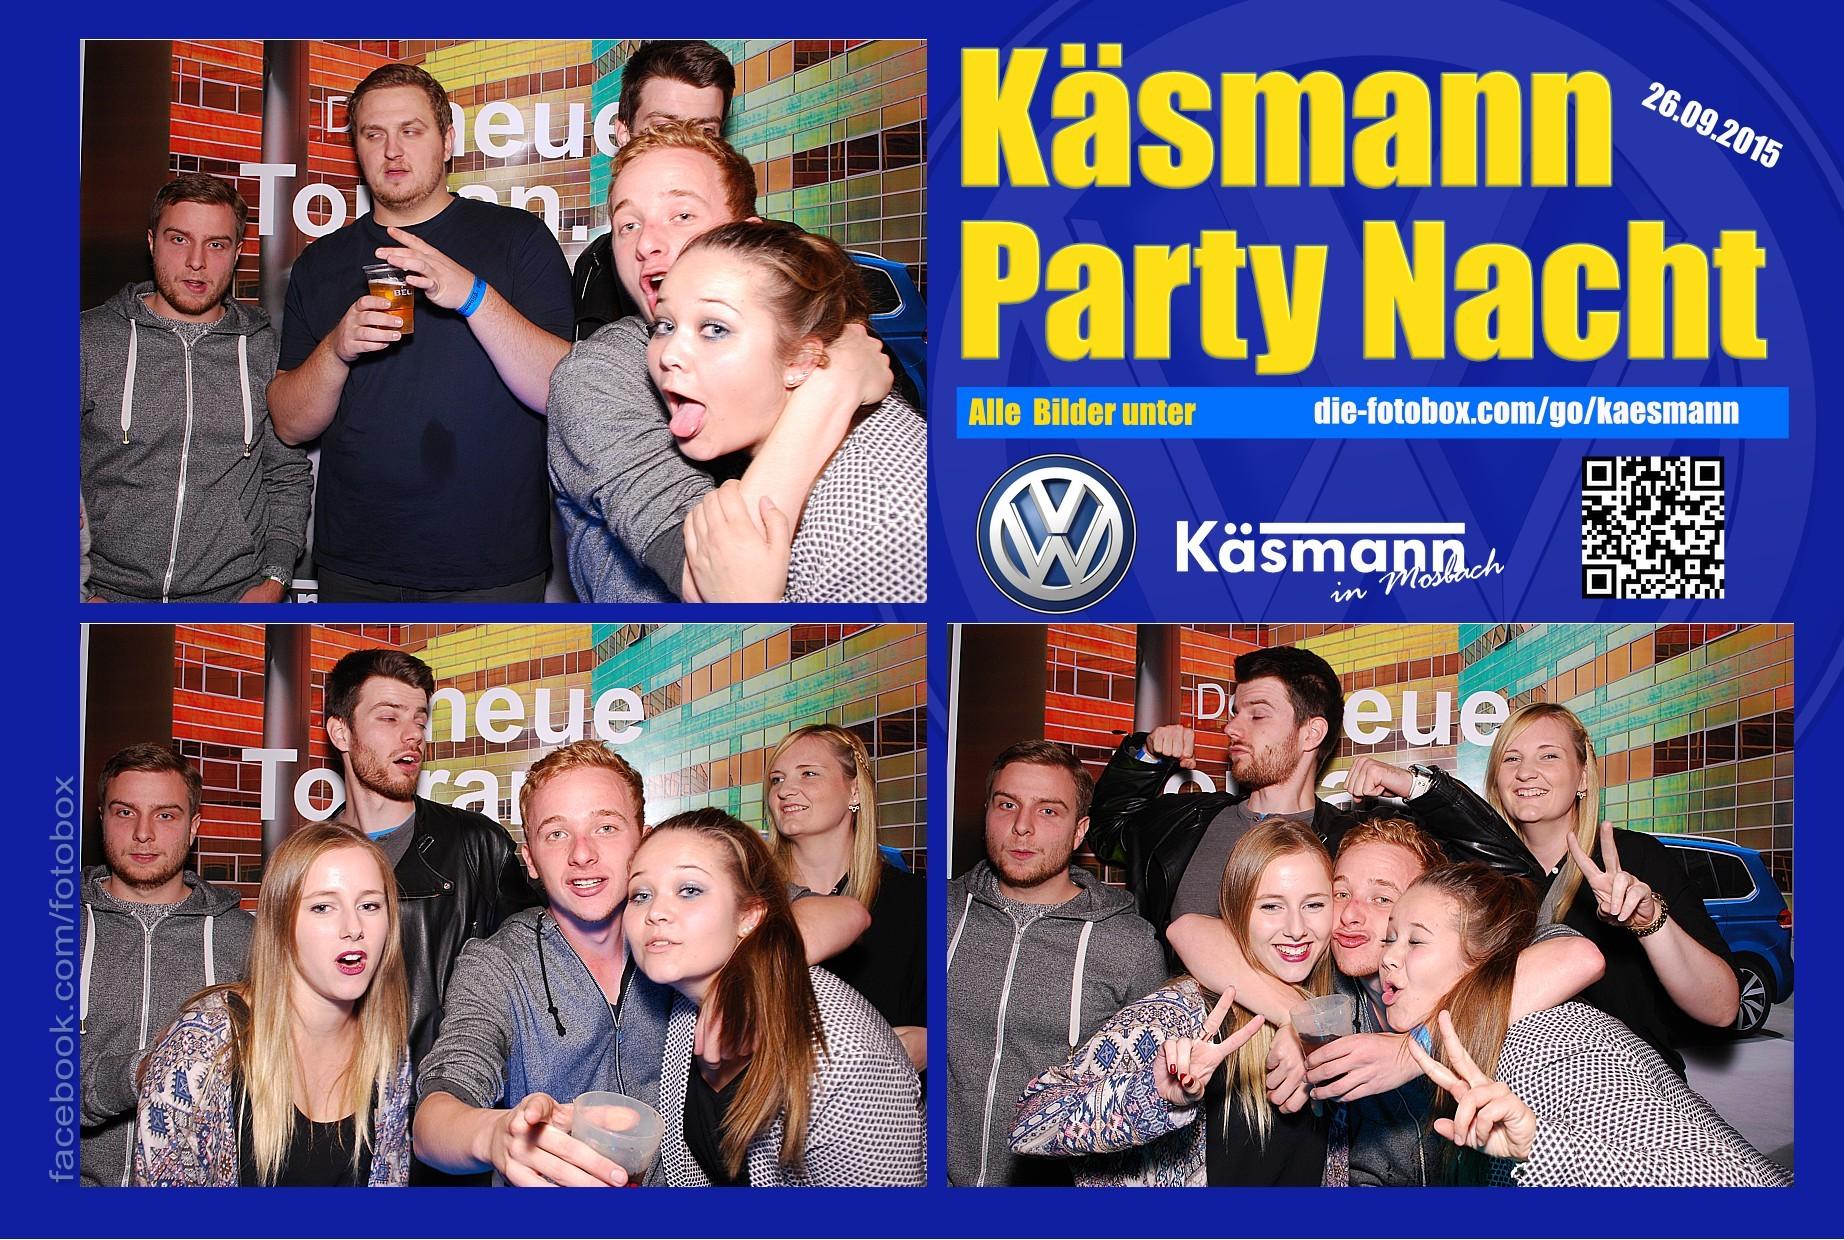 Käsmannparty 2015 - www.die-fotobox.com 01386